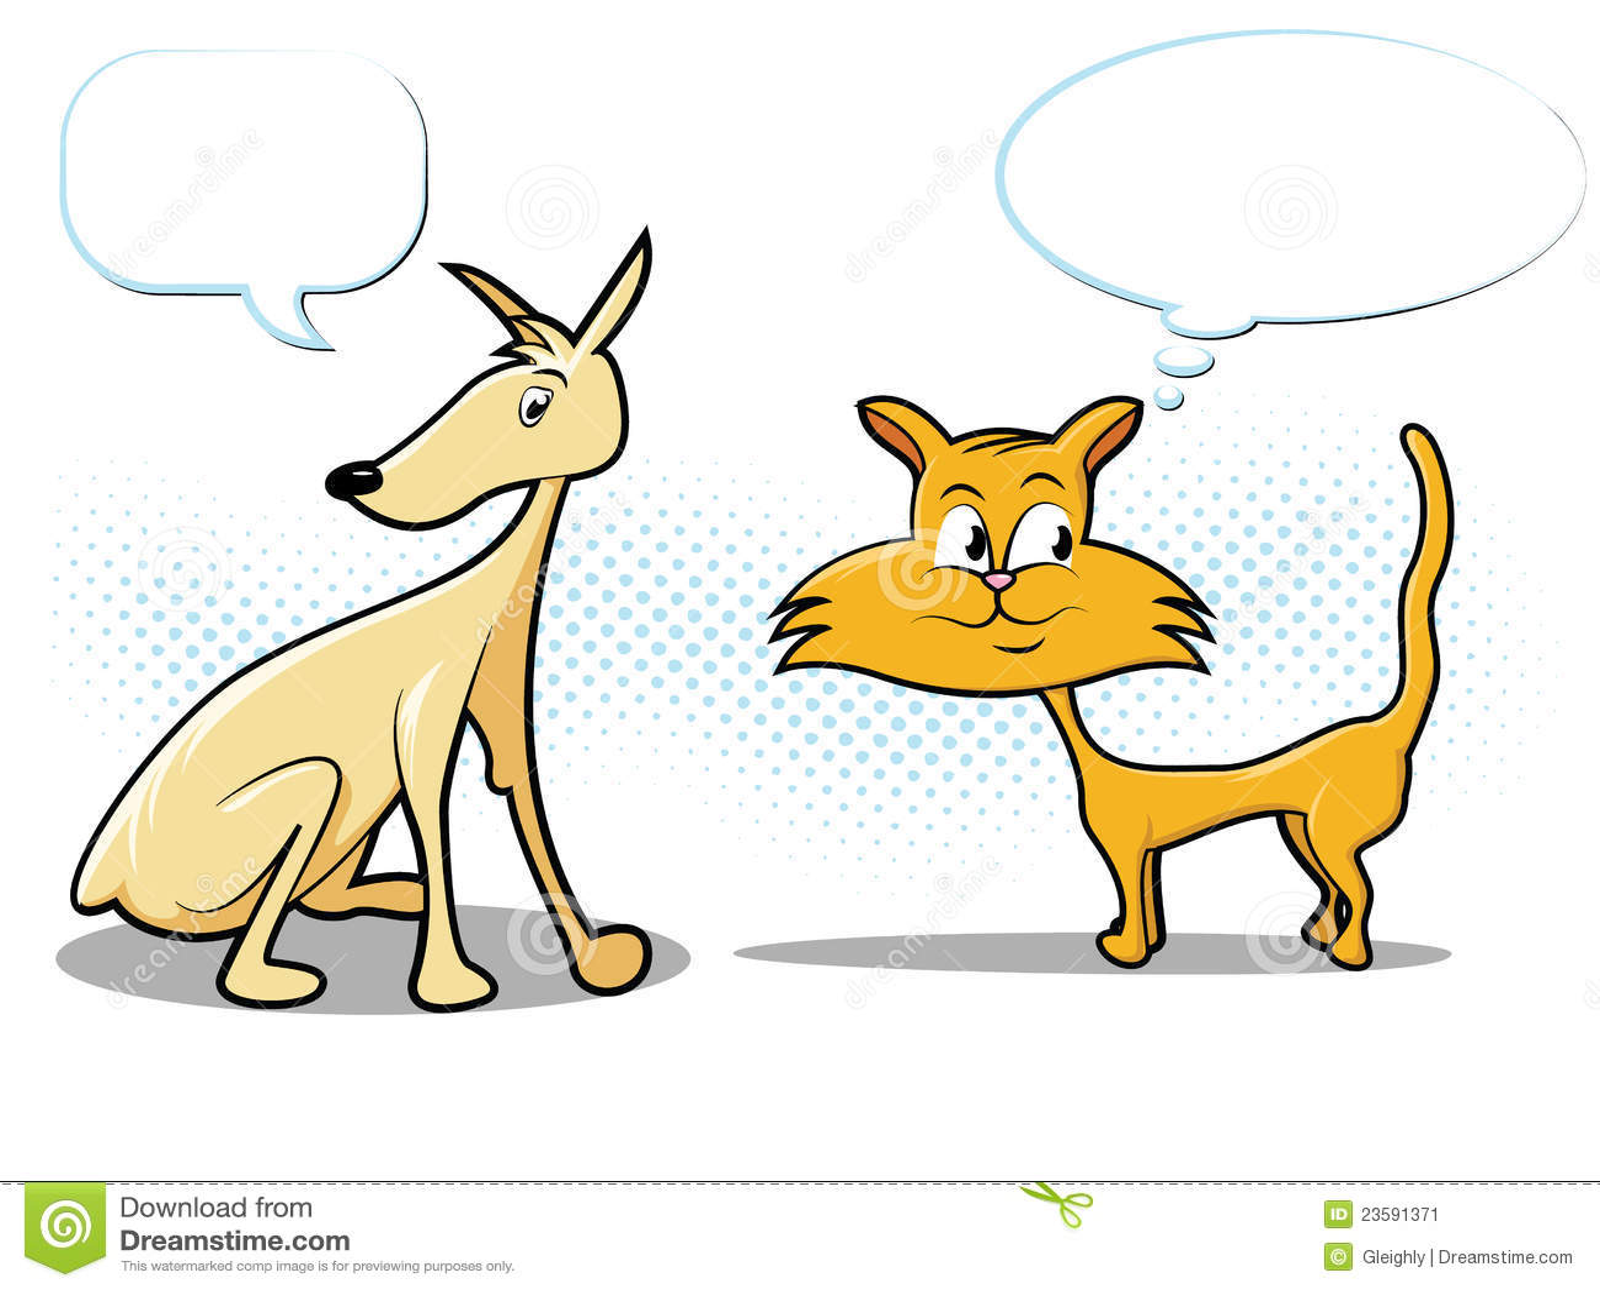 Dog And Cat Cartoon Stock Image - Image: 23591371